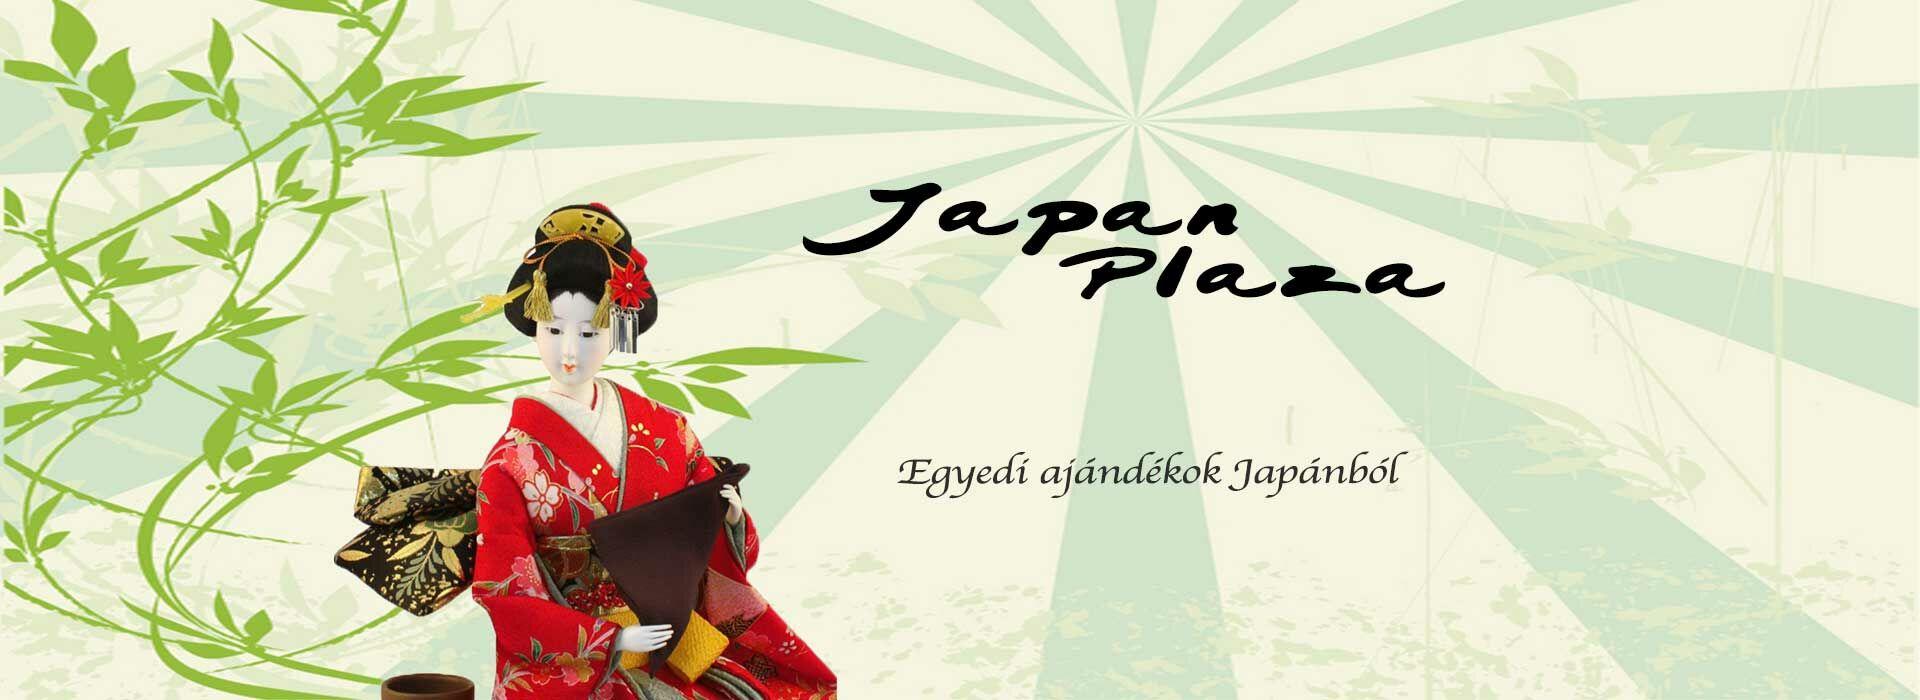 JapanplazaHUN